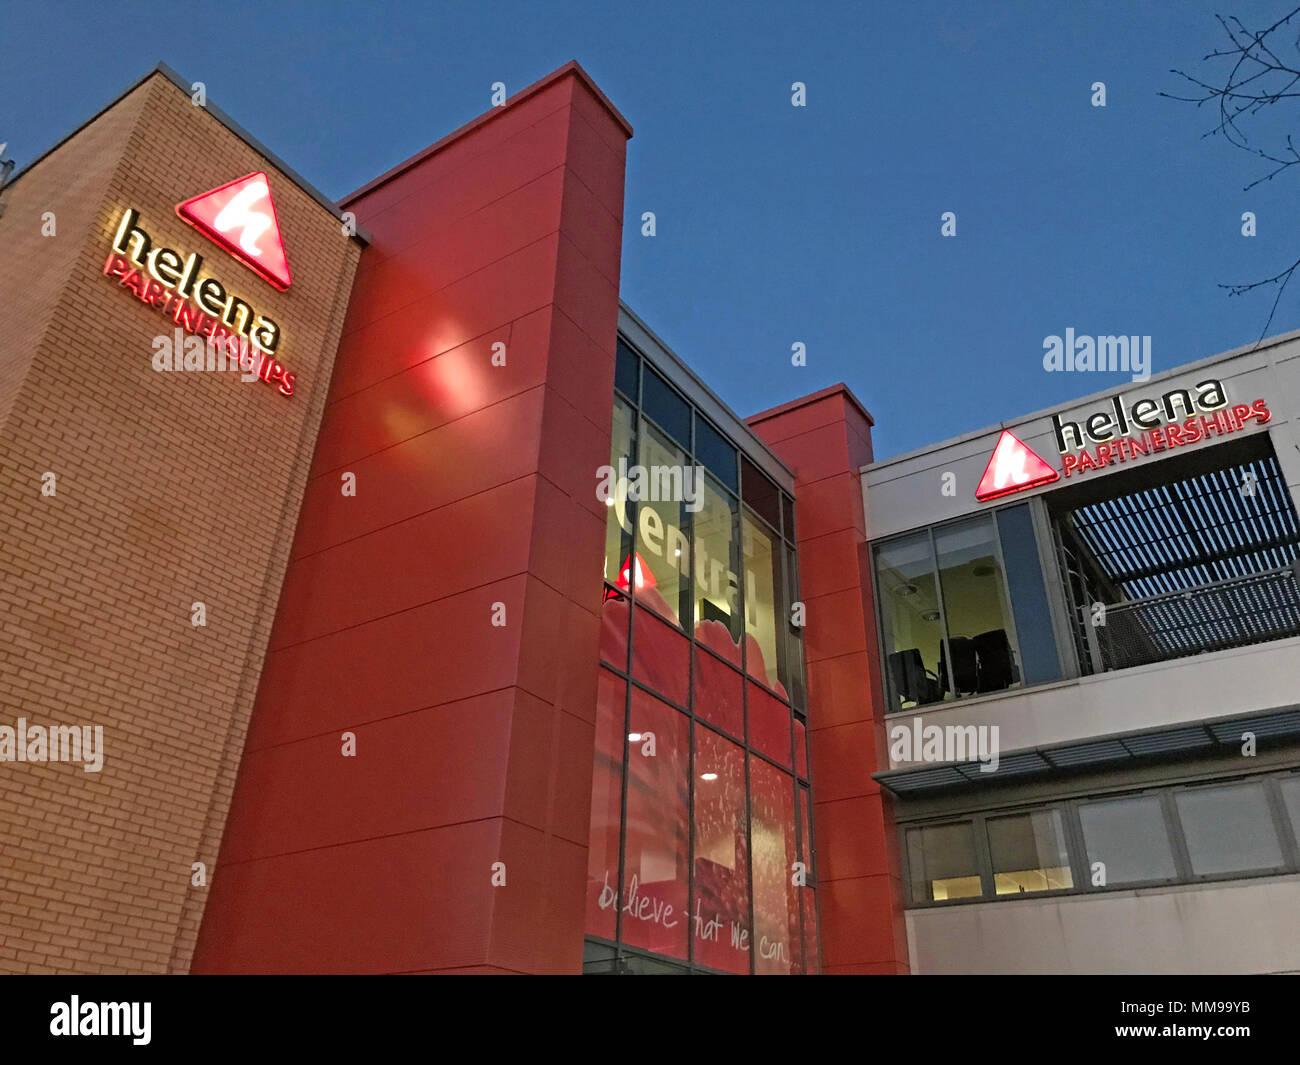 GoTonysmith,@HotpixUK,building,Merseyside,England,UK,SocialHousing,Social